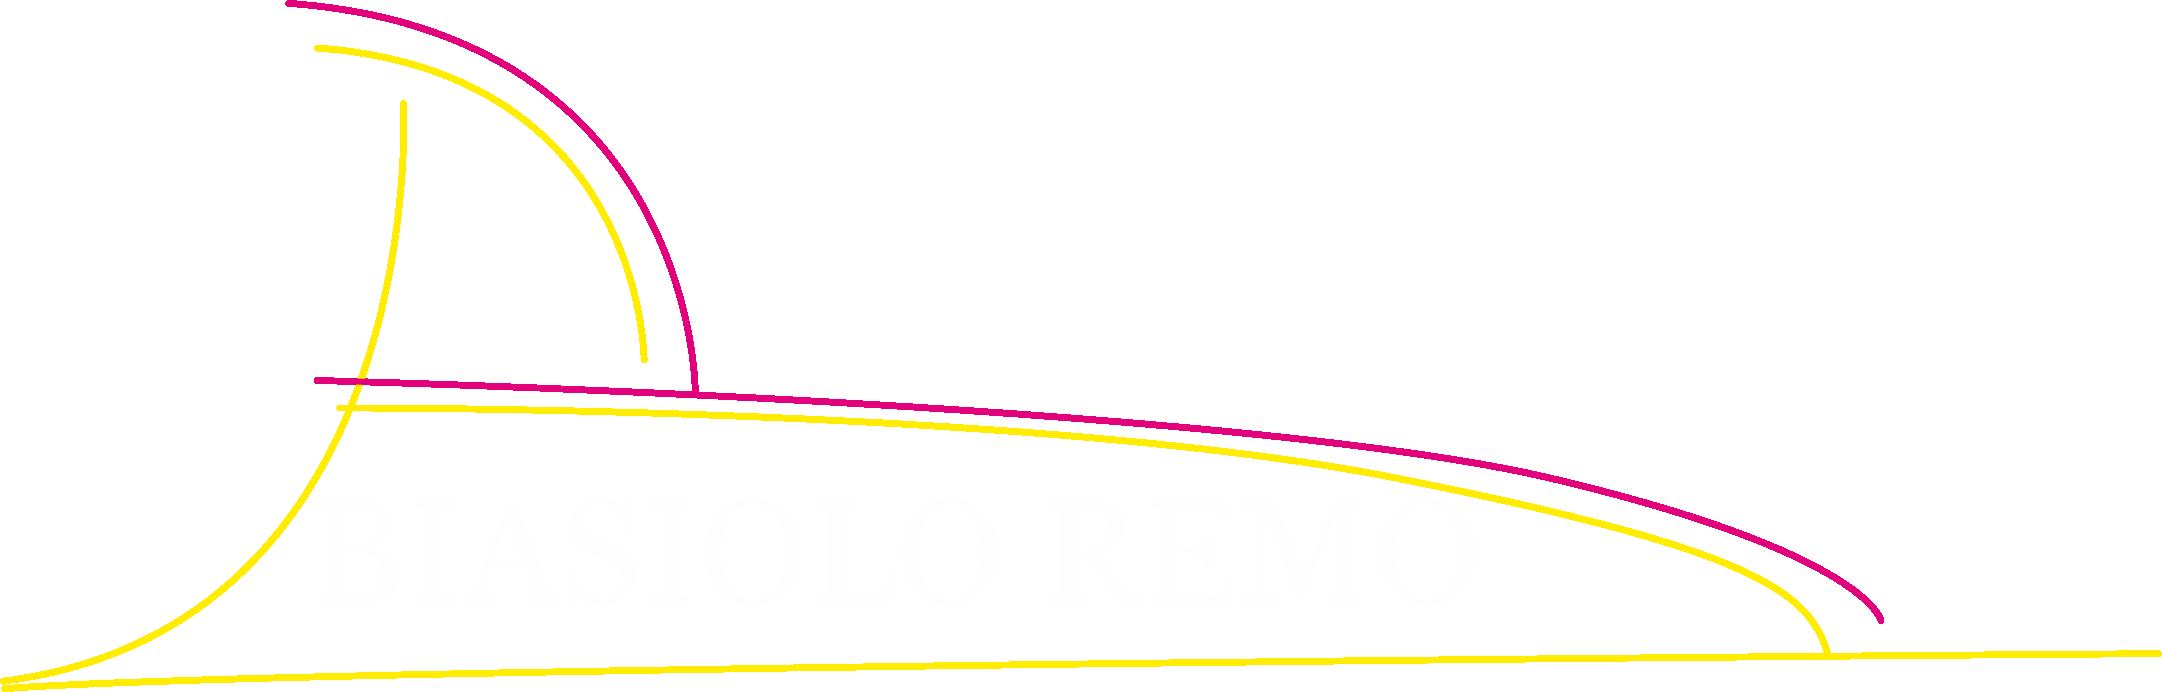 Falegnameria Biasiolo